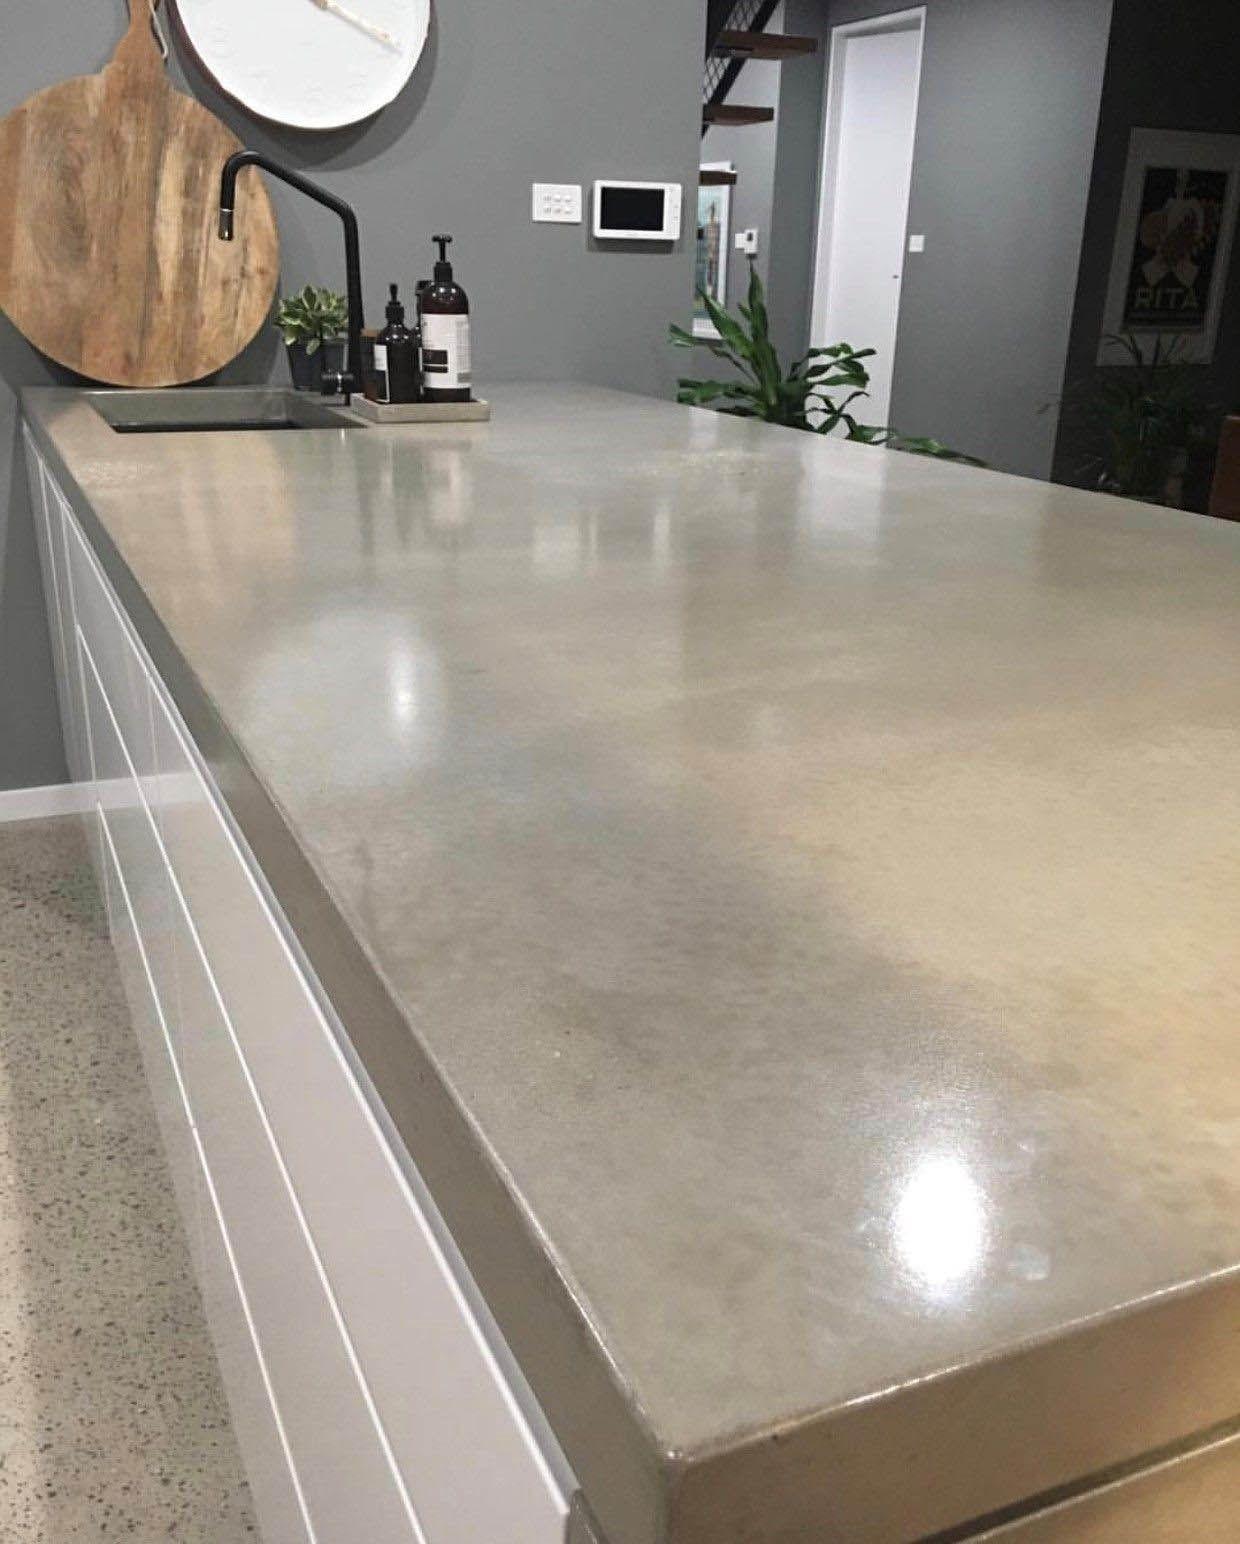 Concrete Countertops Advantages And